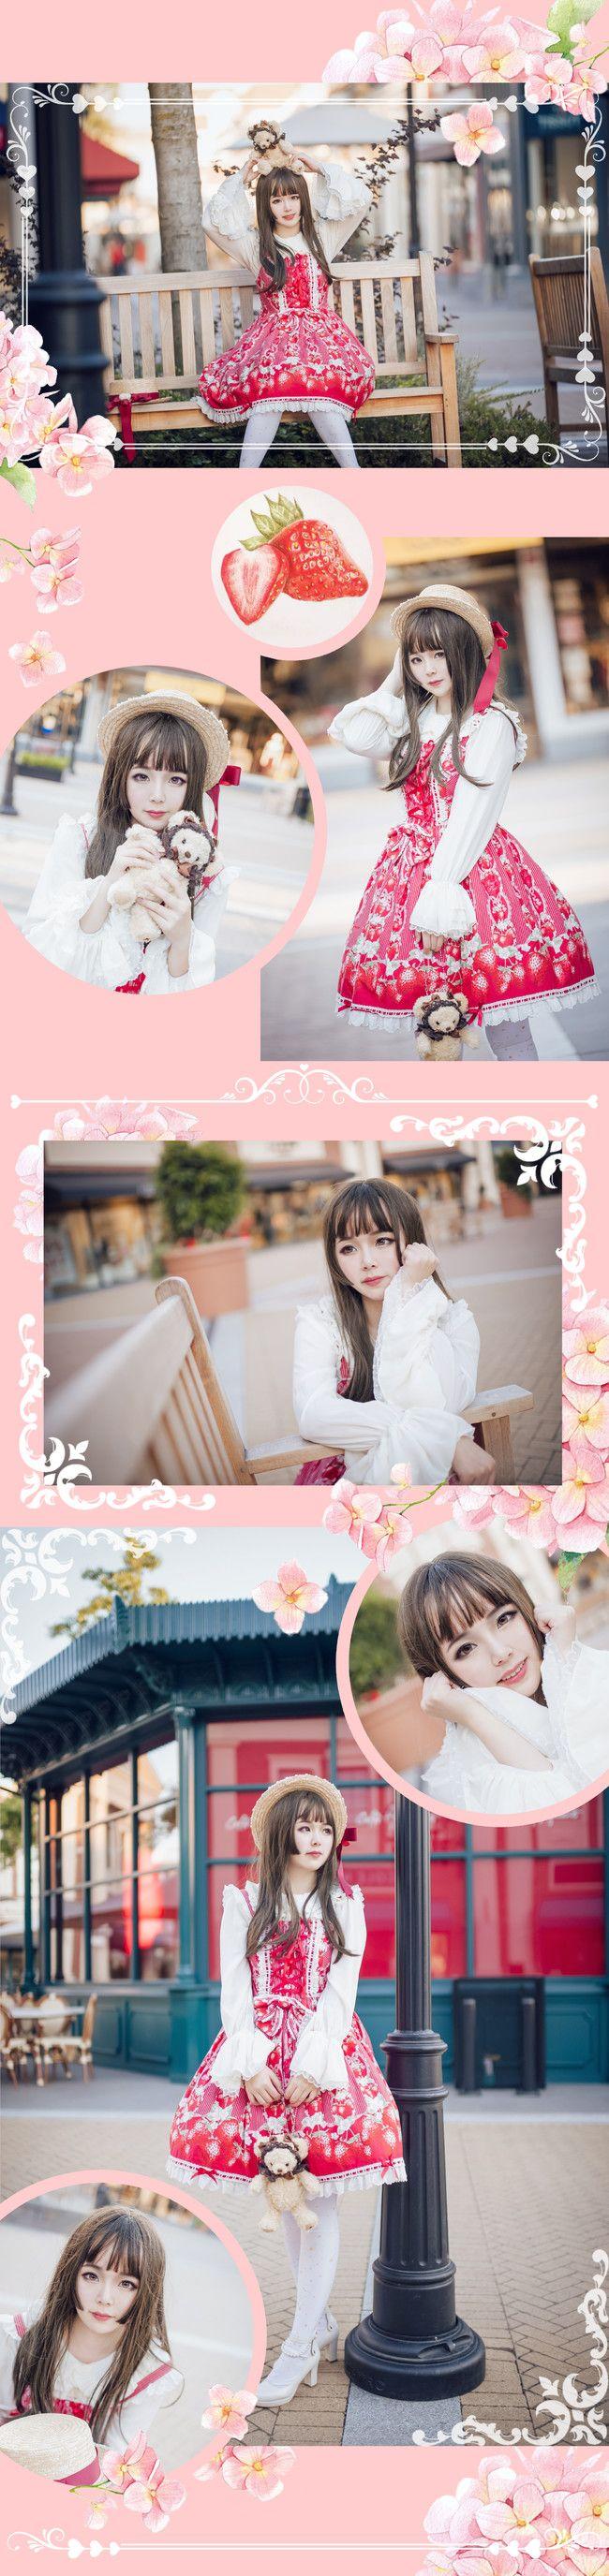 Lolita摘草莓 </p> </div><!-- .entry-content -->  </article><!-- #post-26156 -->  <nav class=